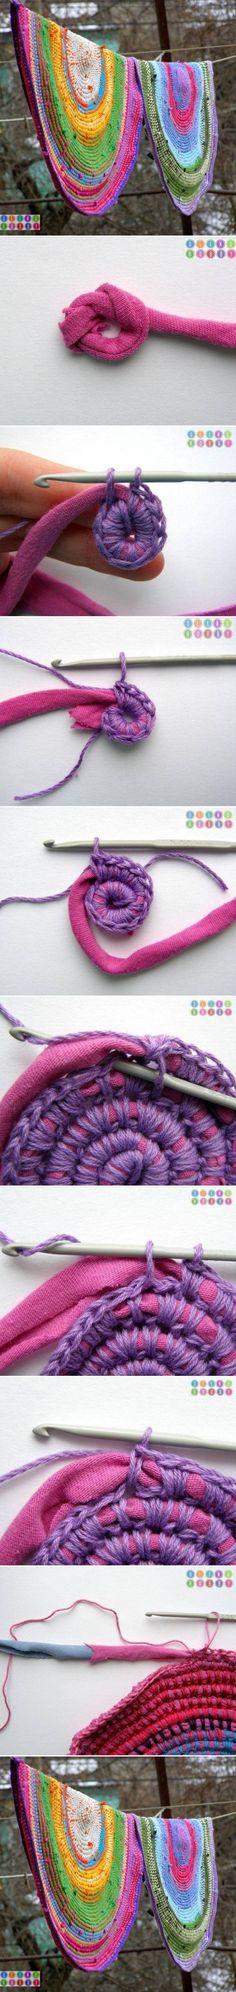 DIY-Old-T-shirt-Crochet-Rug.jpg